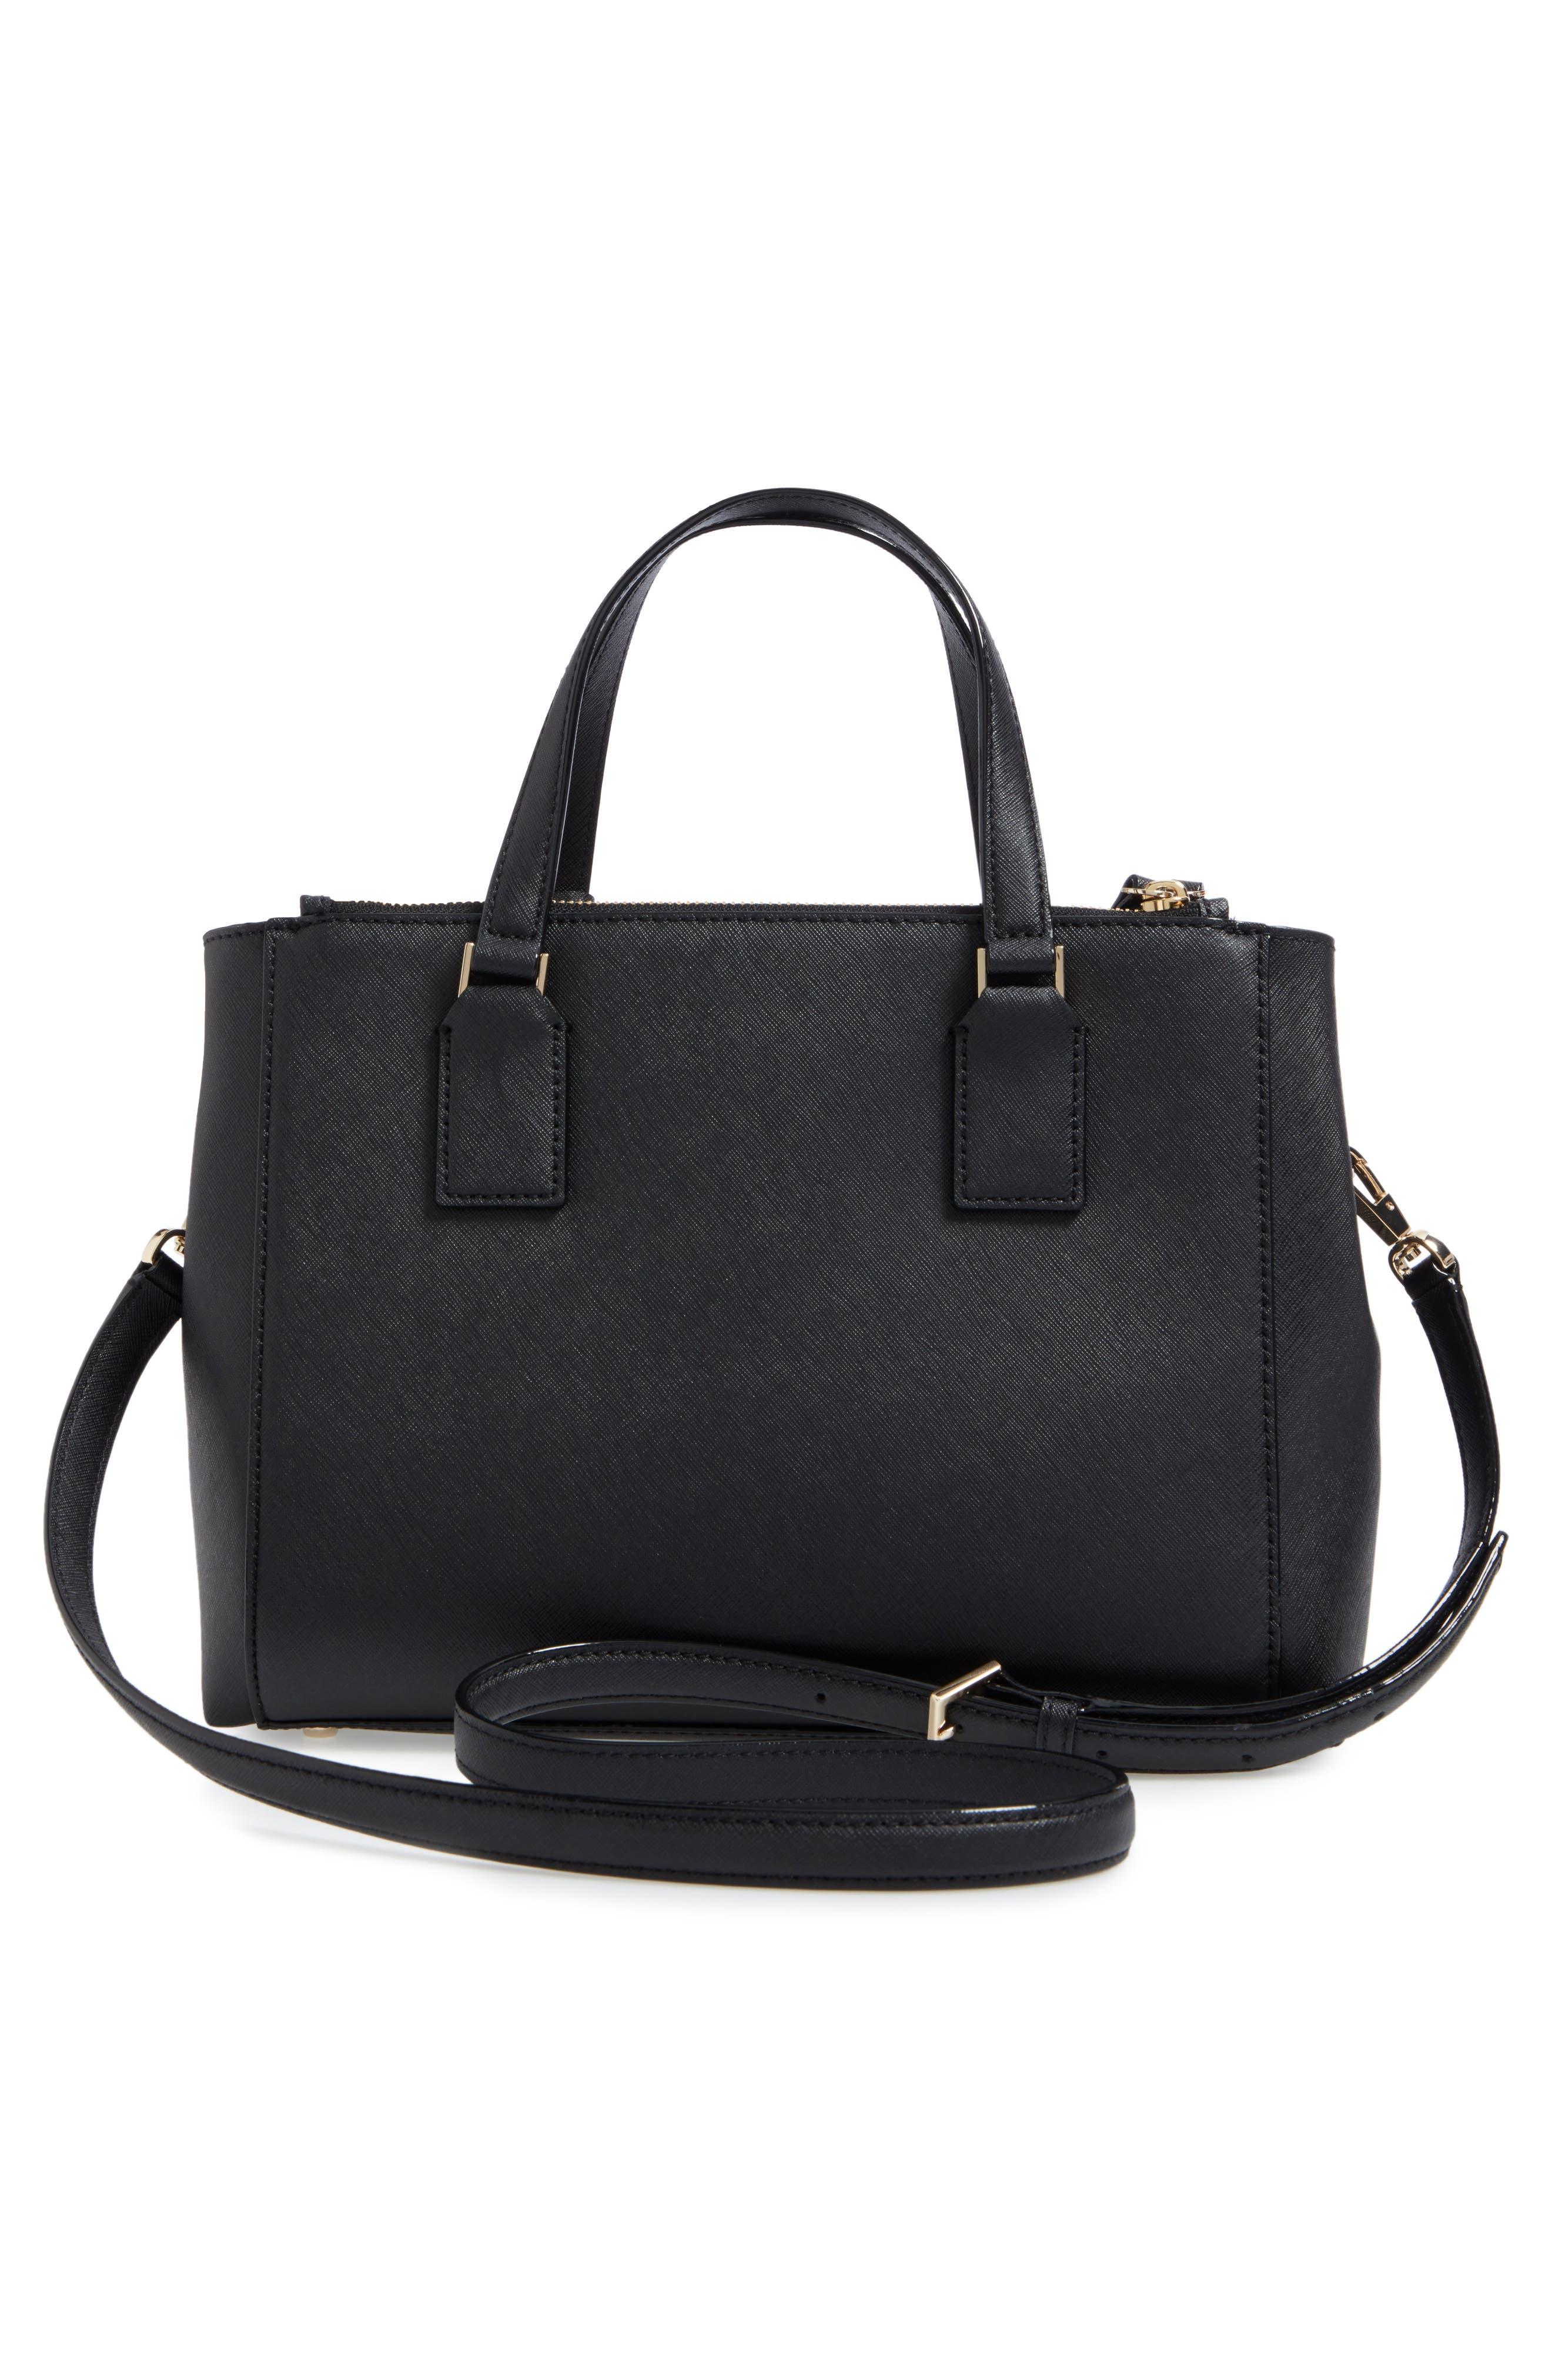 cameron street - teegan calfskin leather satchel,                             Alternate thumbnail 3, color,                             Black